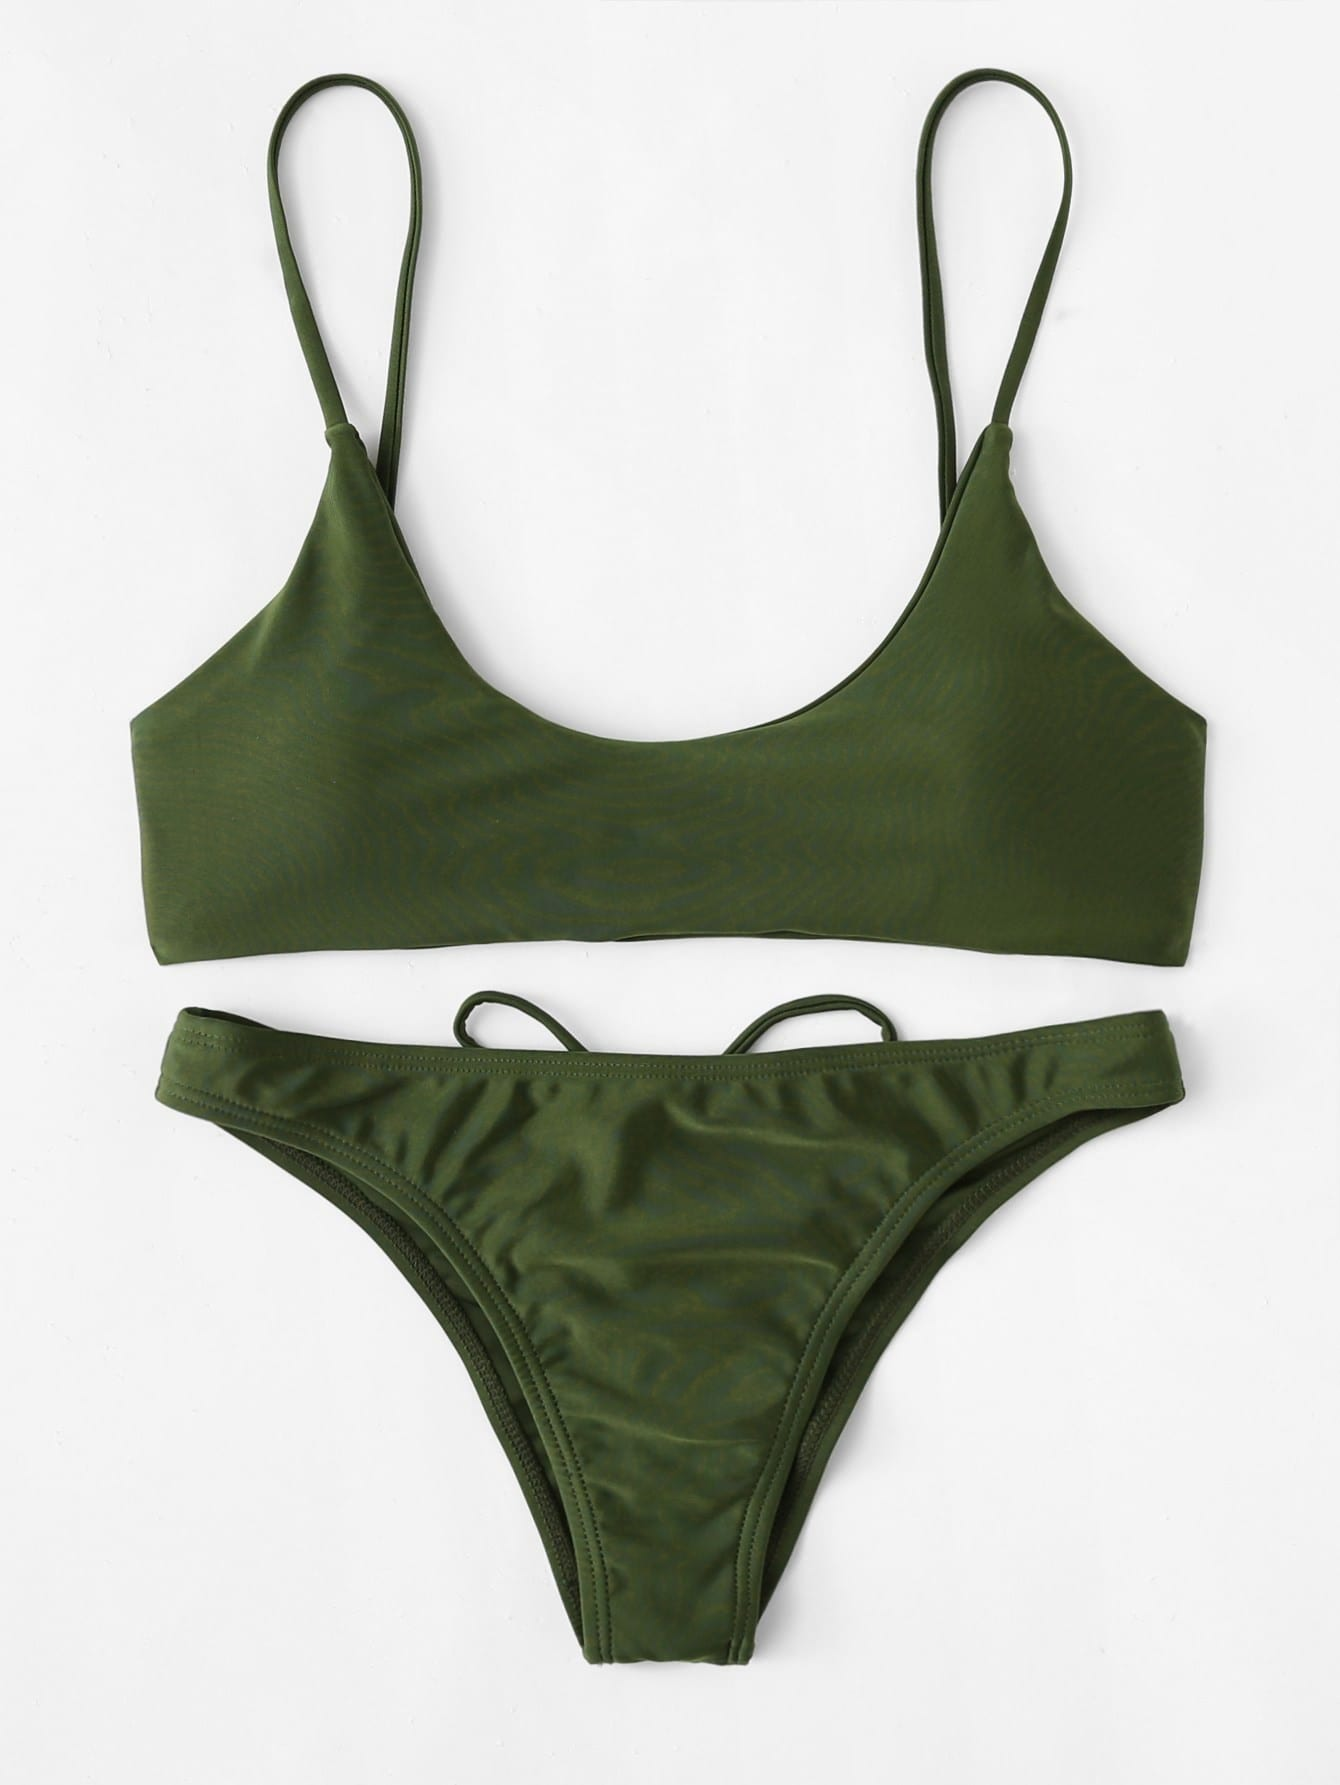 Criss Cross Drawstring Bikini Set criss cross bikini set